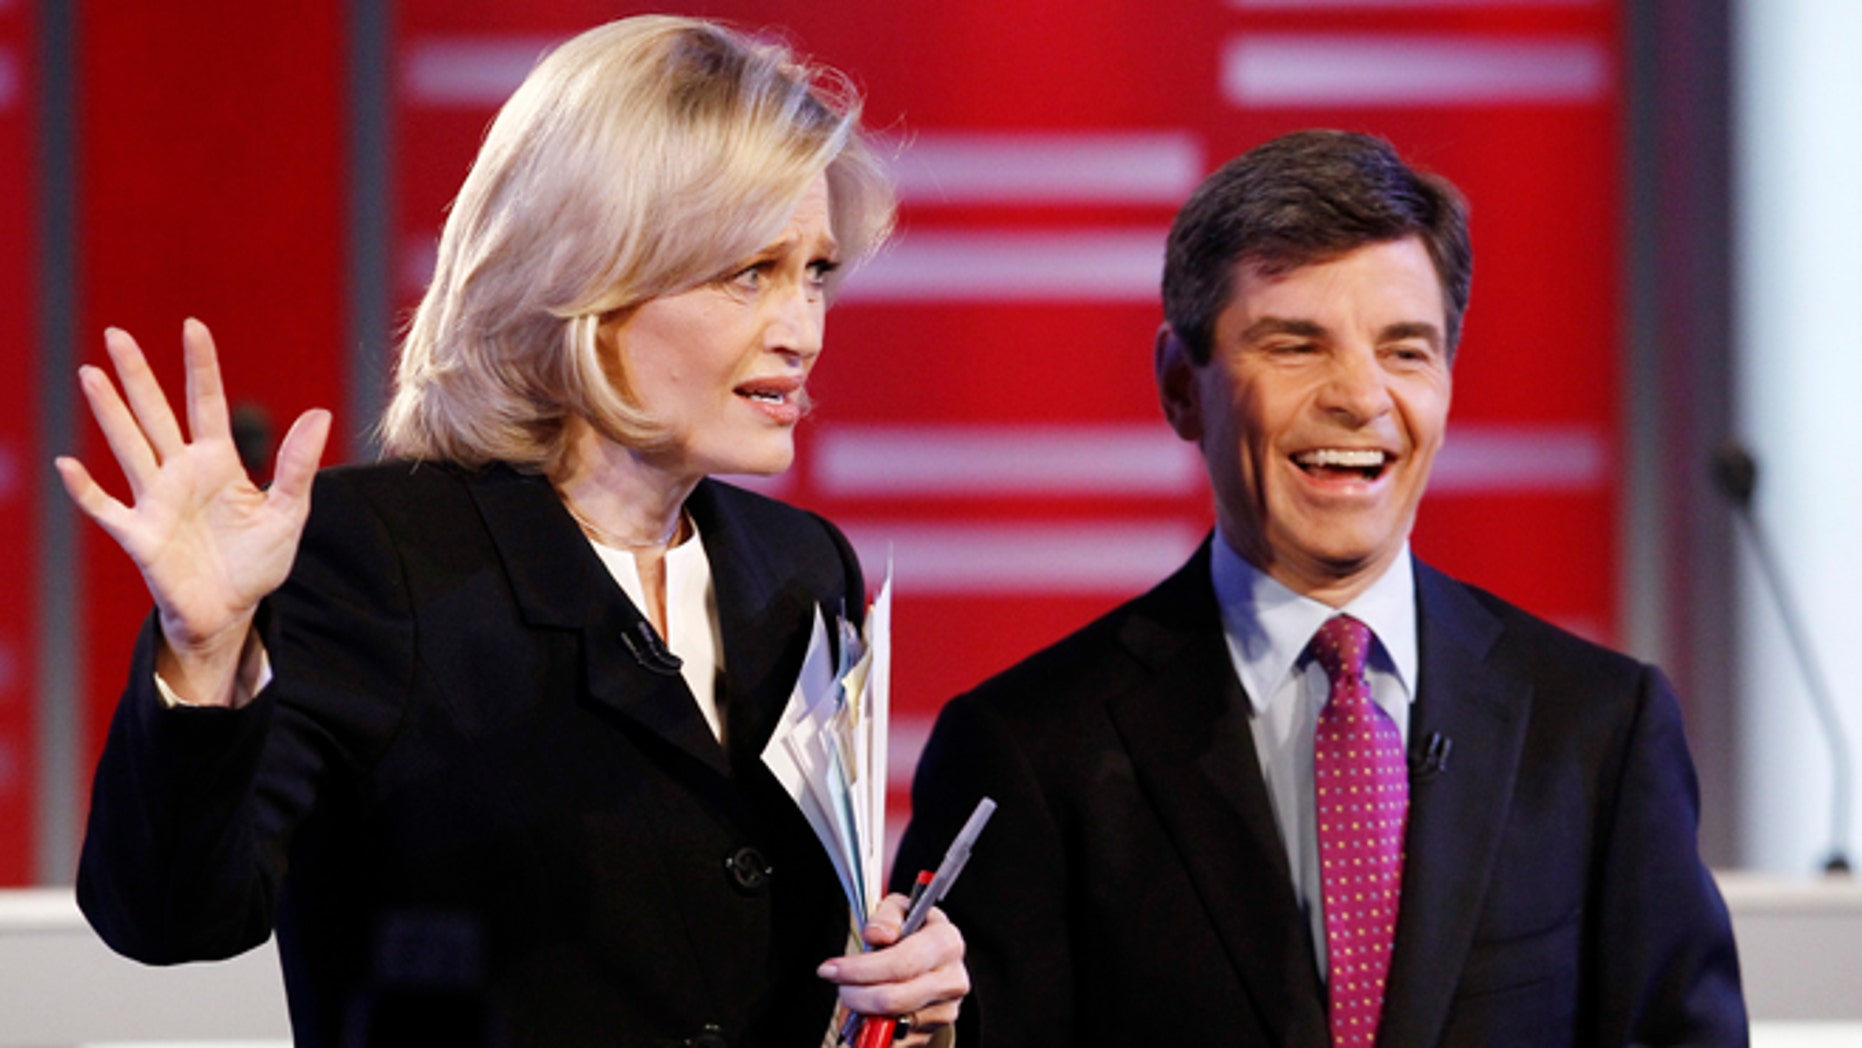 Dec. 10, 2011: Debate moderators Diane Sawyer and George Stephanopoulos speak before the Republican presidential candidates debate at Drake University in Des Moines, Iowa.